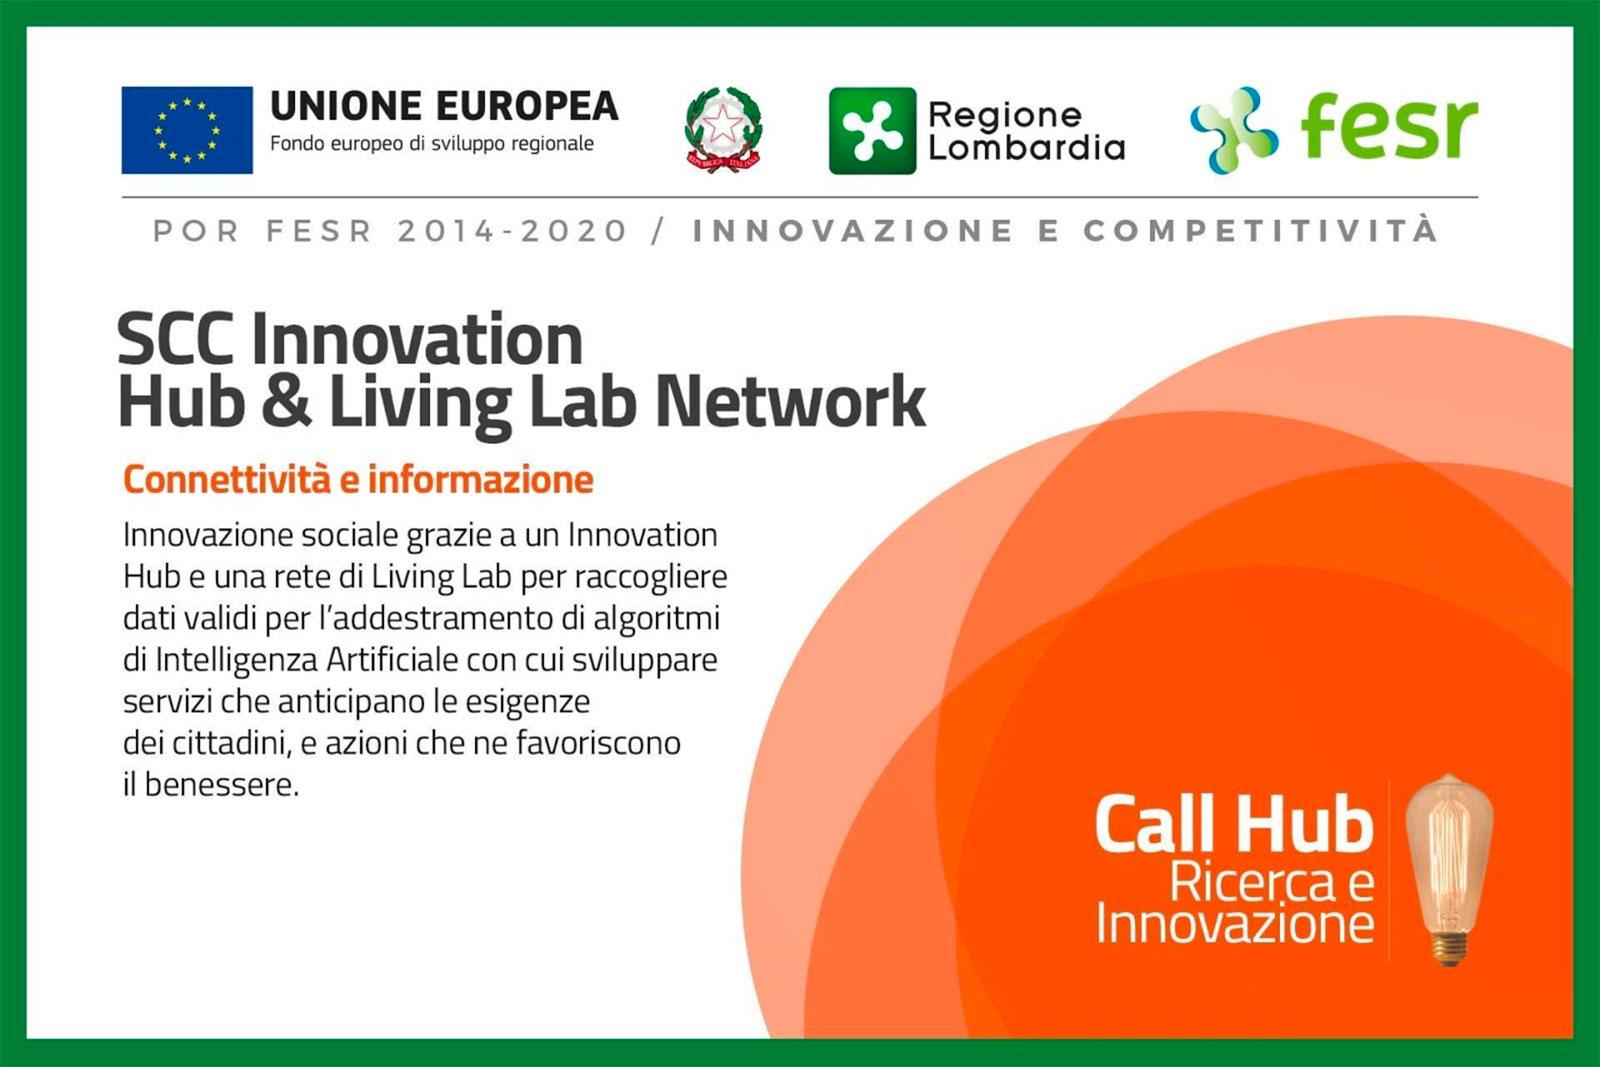 SCC Innovation - Hub & Living Lab Network